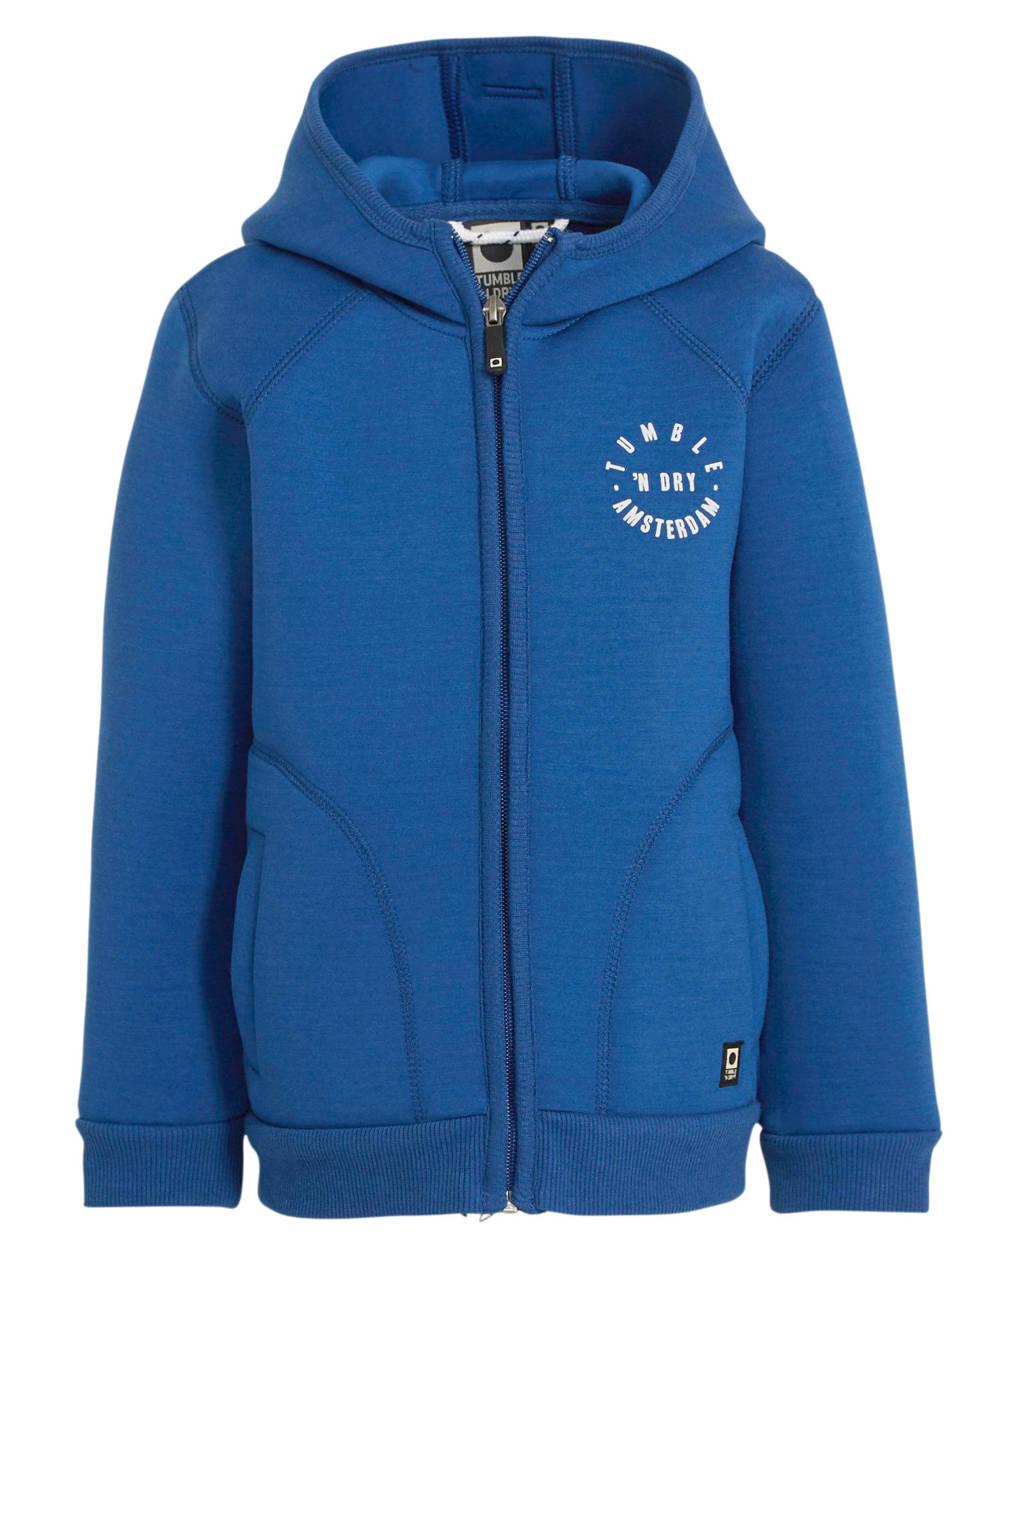 Tumble 'n Dry Mid zomerjas Willy met tekst blauw/wit, Blauw/wit